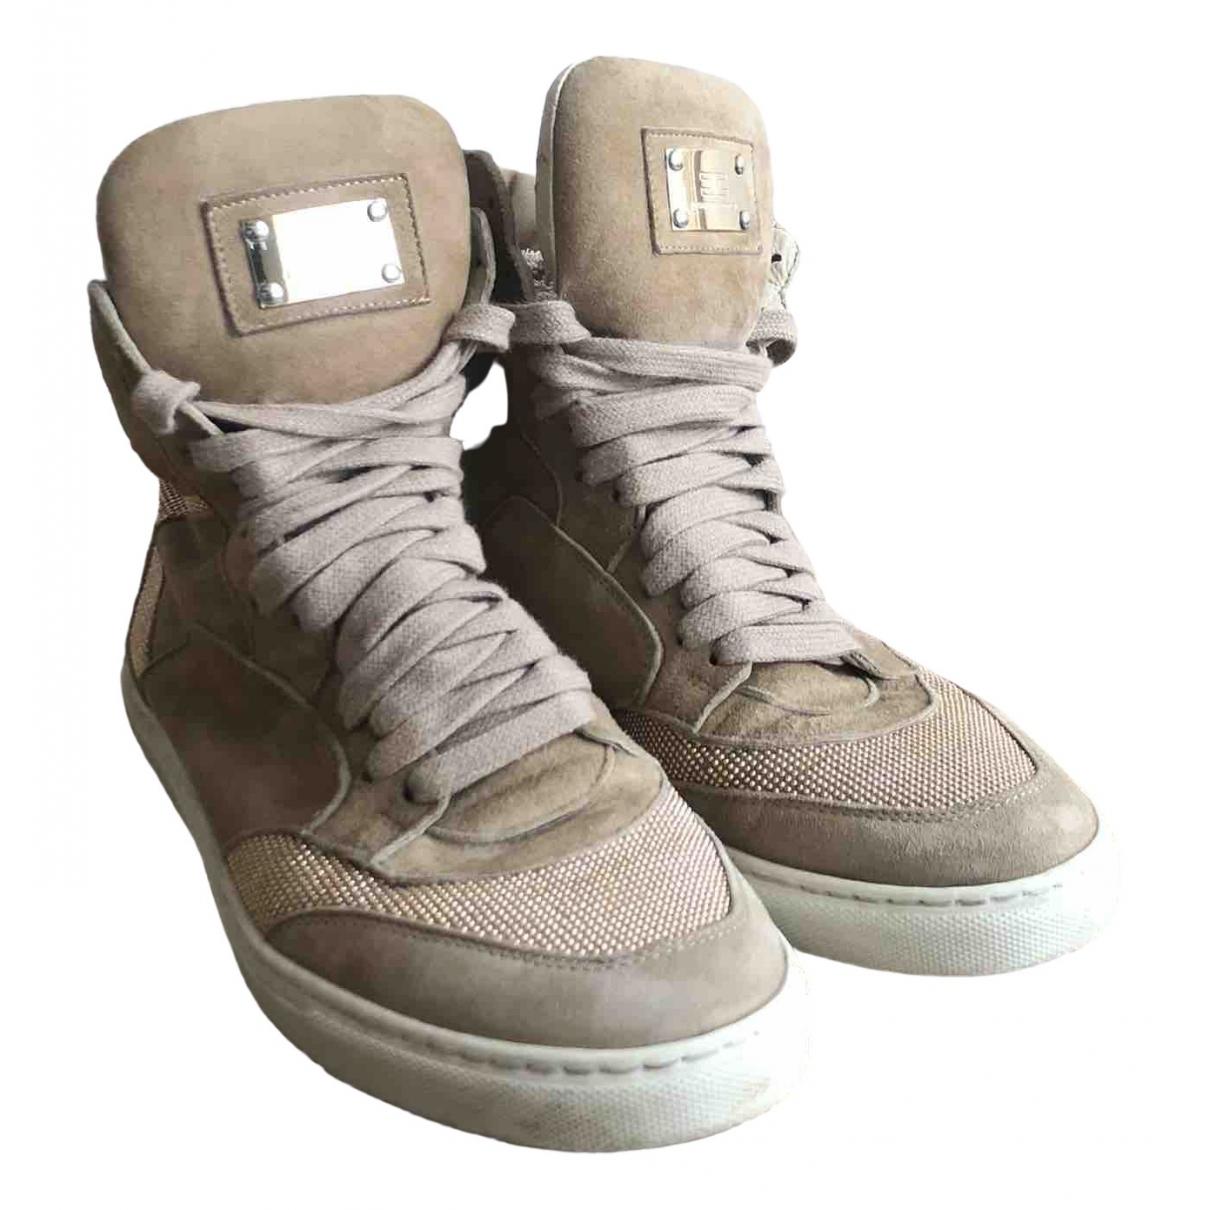 Elisabetta Franchi \N Sneakers in  Beige Leder